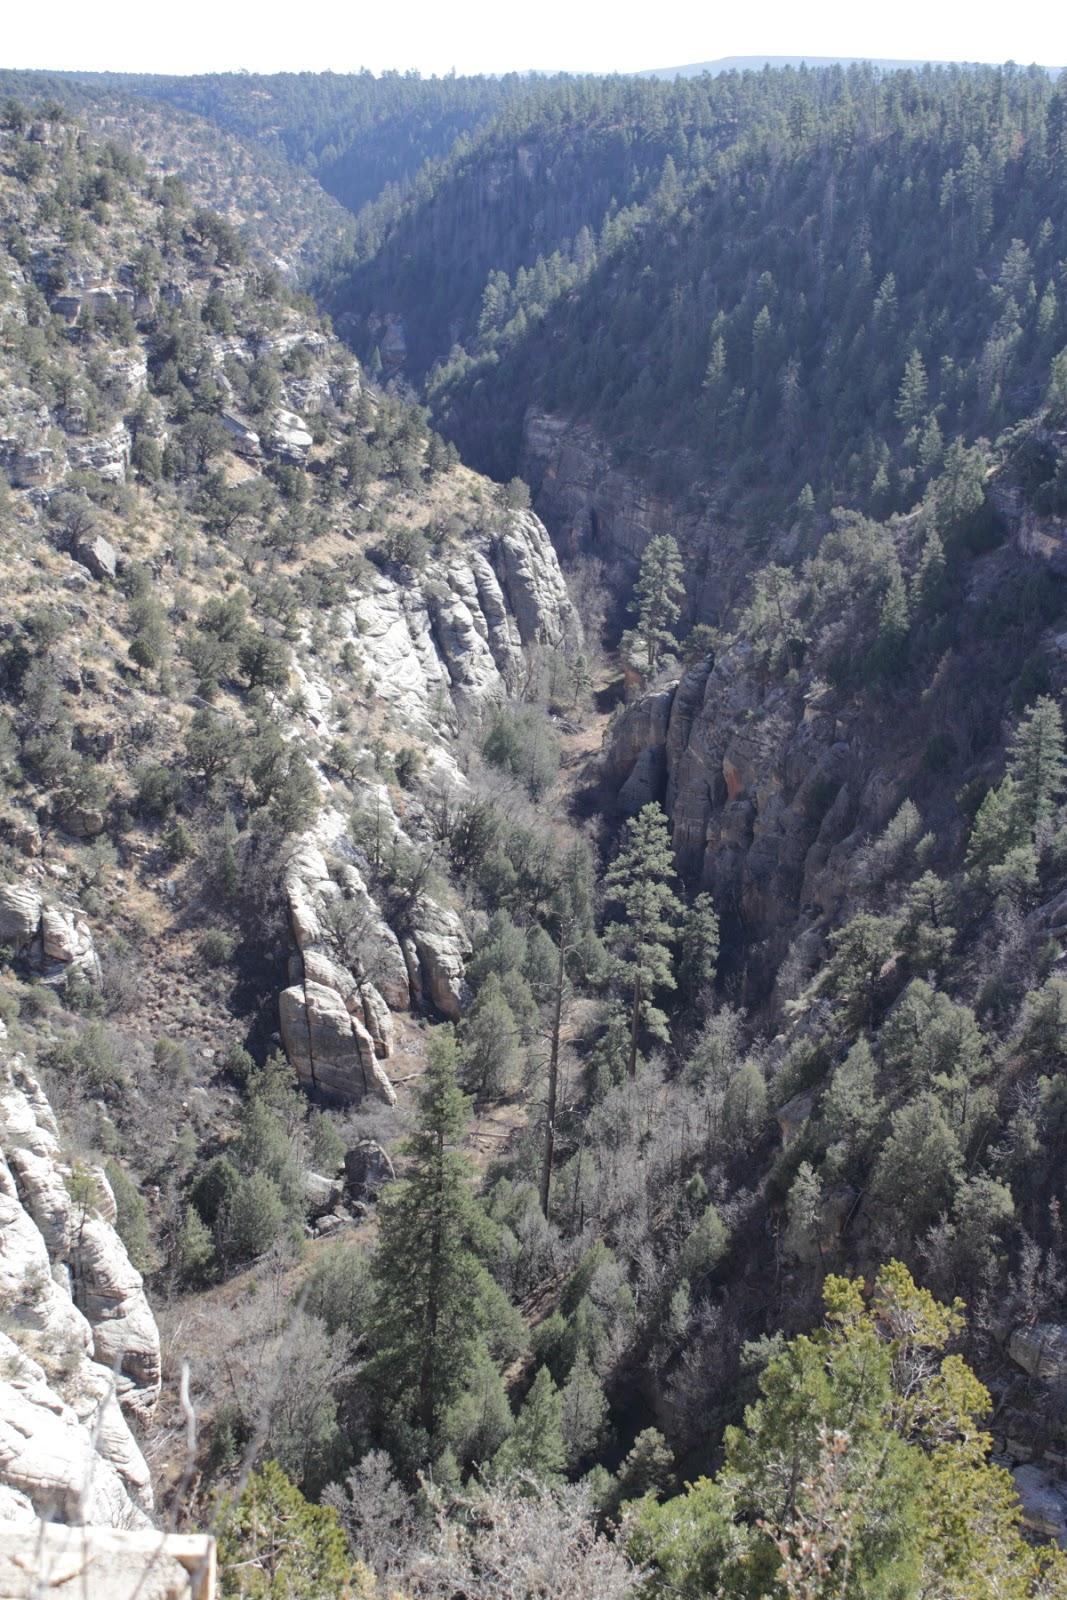 Walnut Canyon National Monument http://www.nps.gov/waca/index.htm